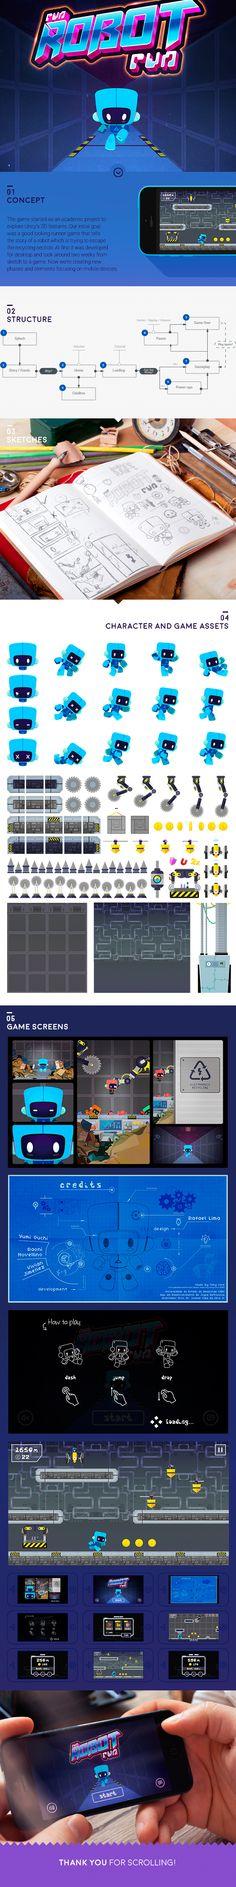 Run Robot, Run! Game Design, Illustration, UI/UX  Design by - Rafael Lima